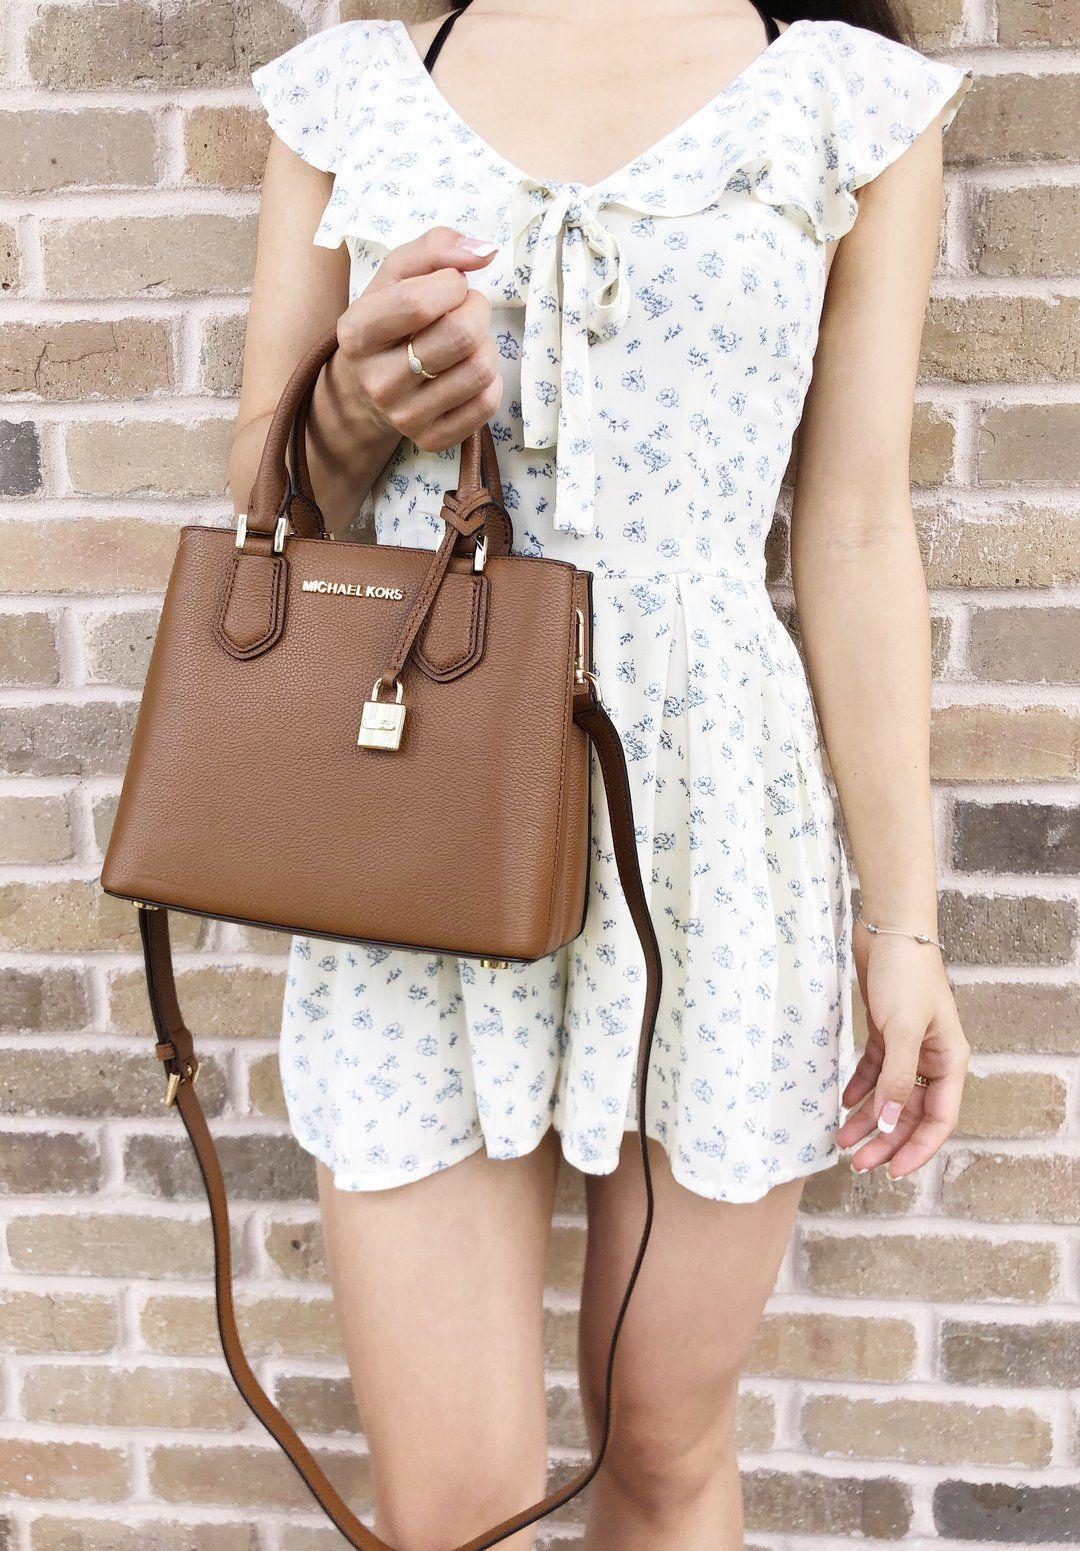 5a8754cc797f Michael Kors Adele Mercer Medium Messenger Bag Luggage - Gaby's Bags